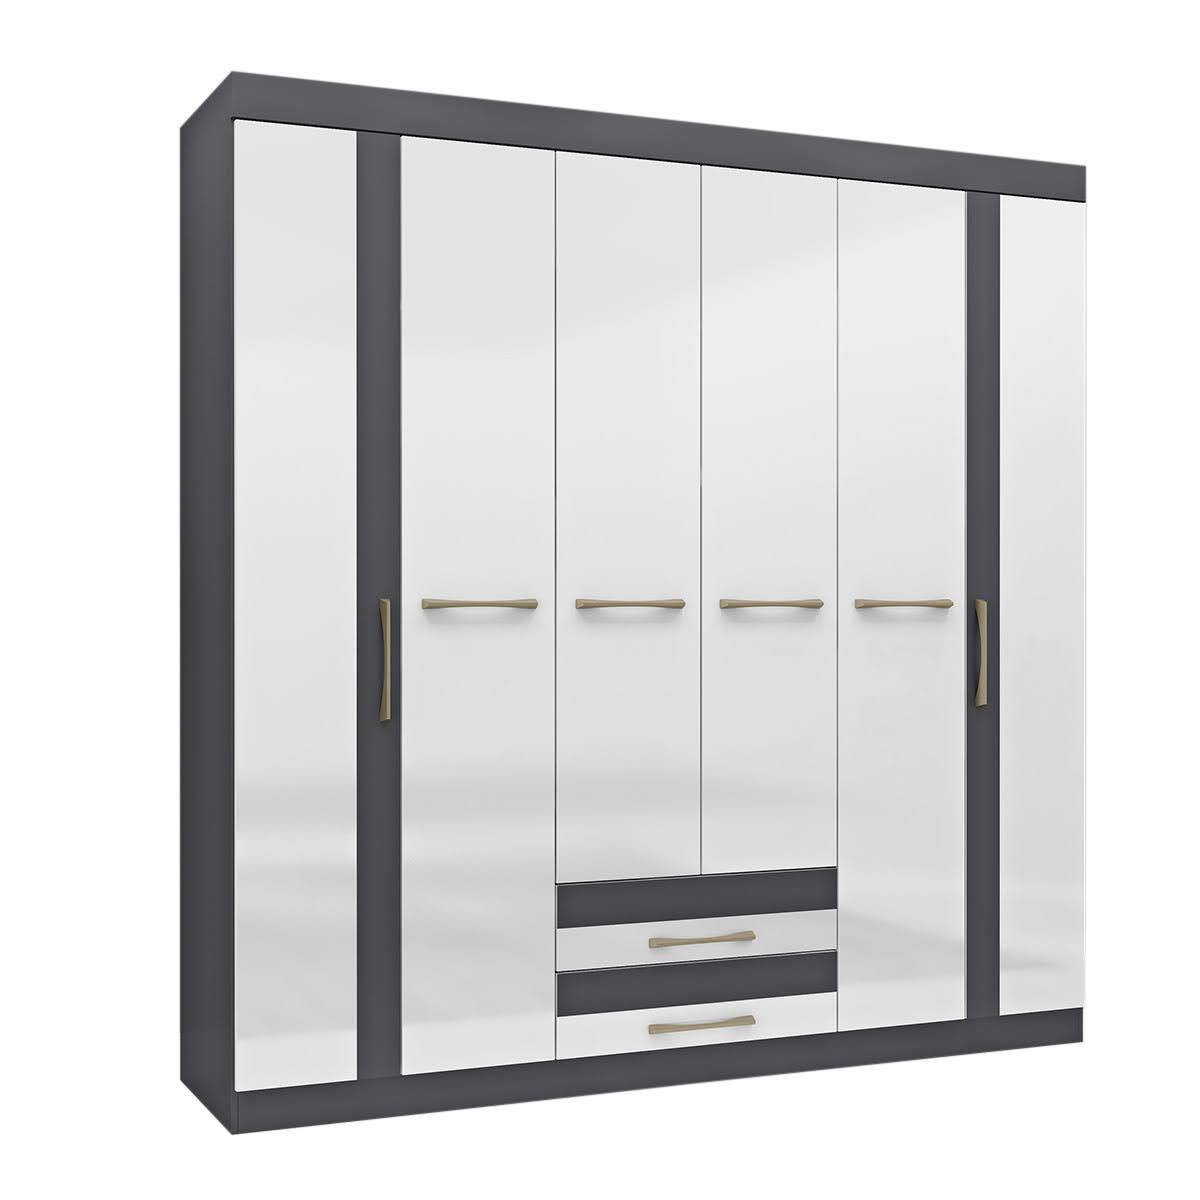 Mueble Ropero Armario Closet 6 Puertas Gris Blanco Recamara